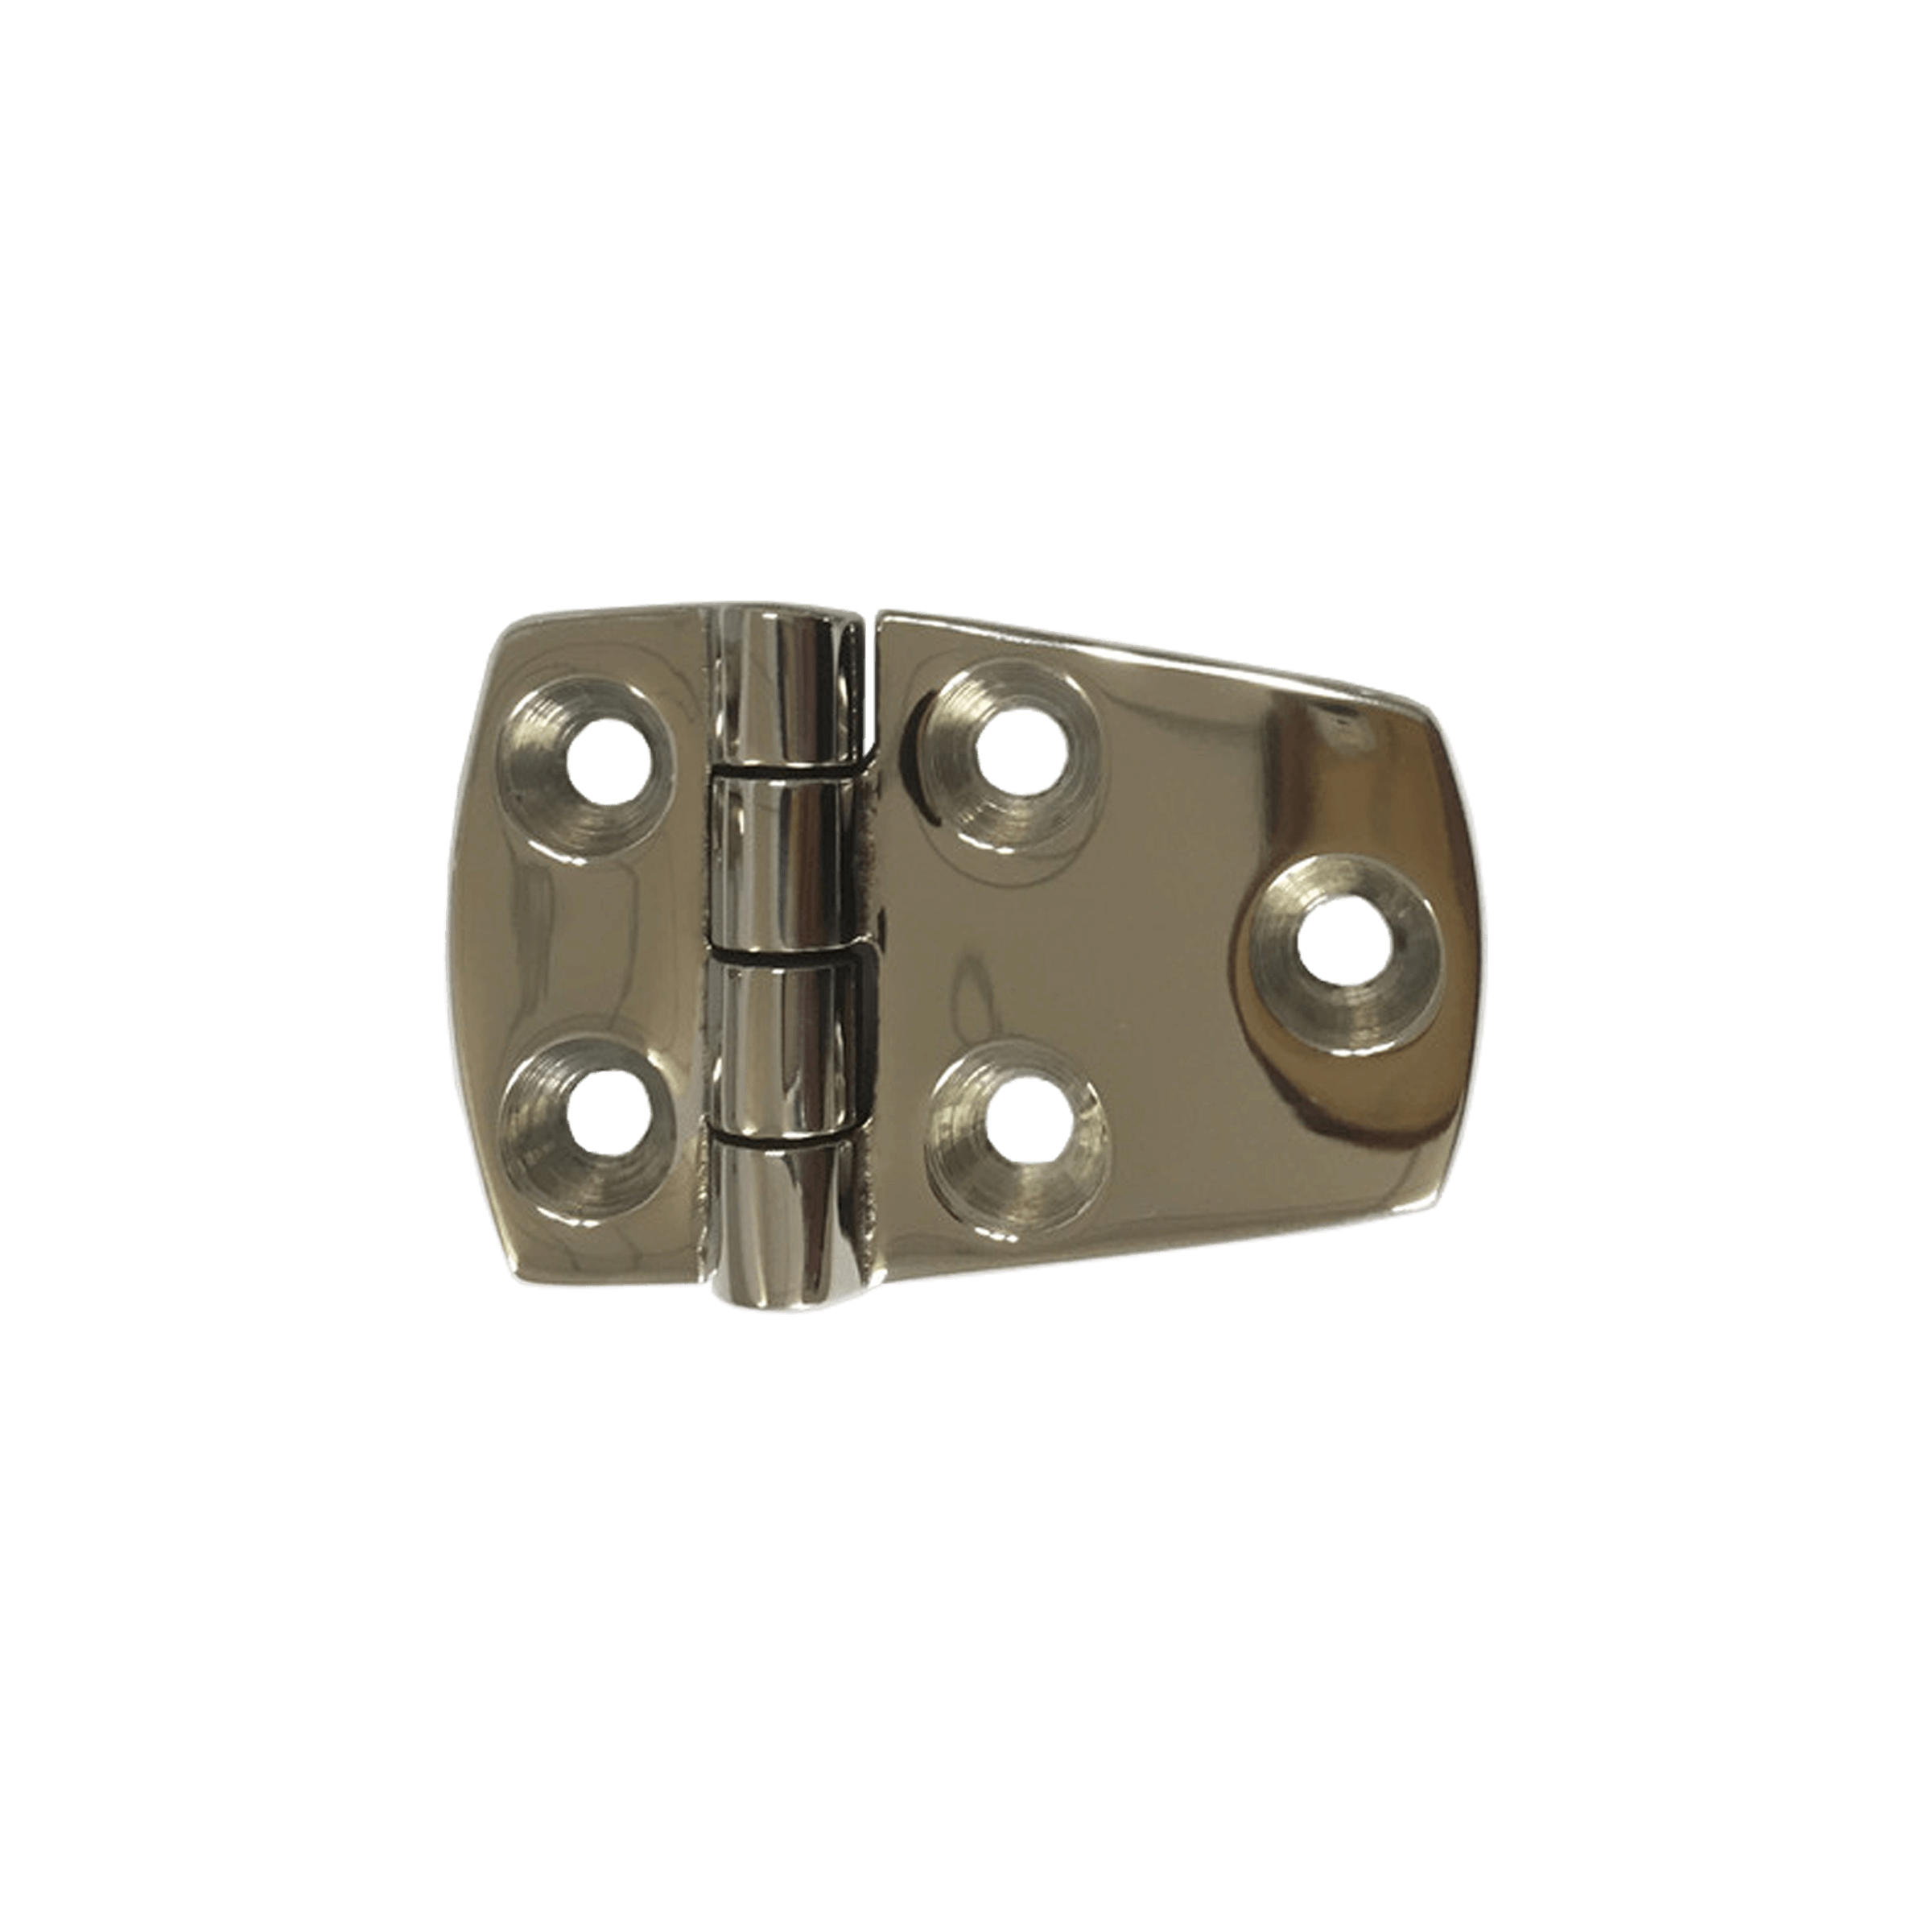 OEM Stainless steel marine hardware square cabin hinge boat accessories marine hinge Thumb 2